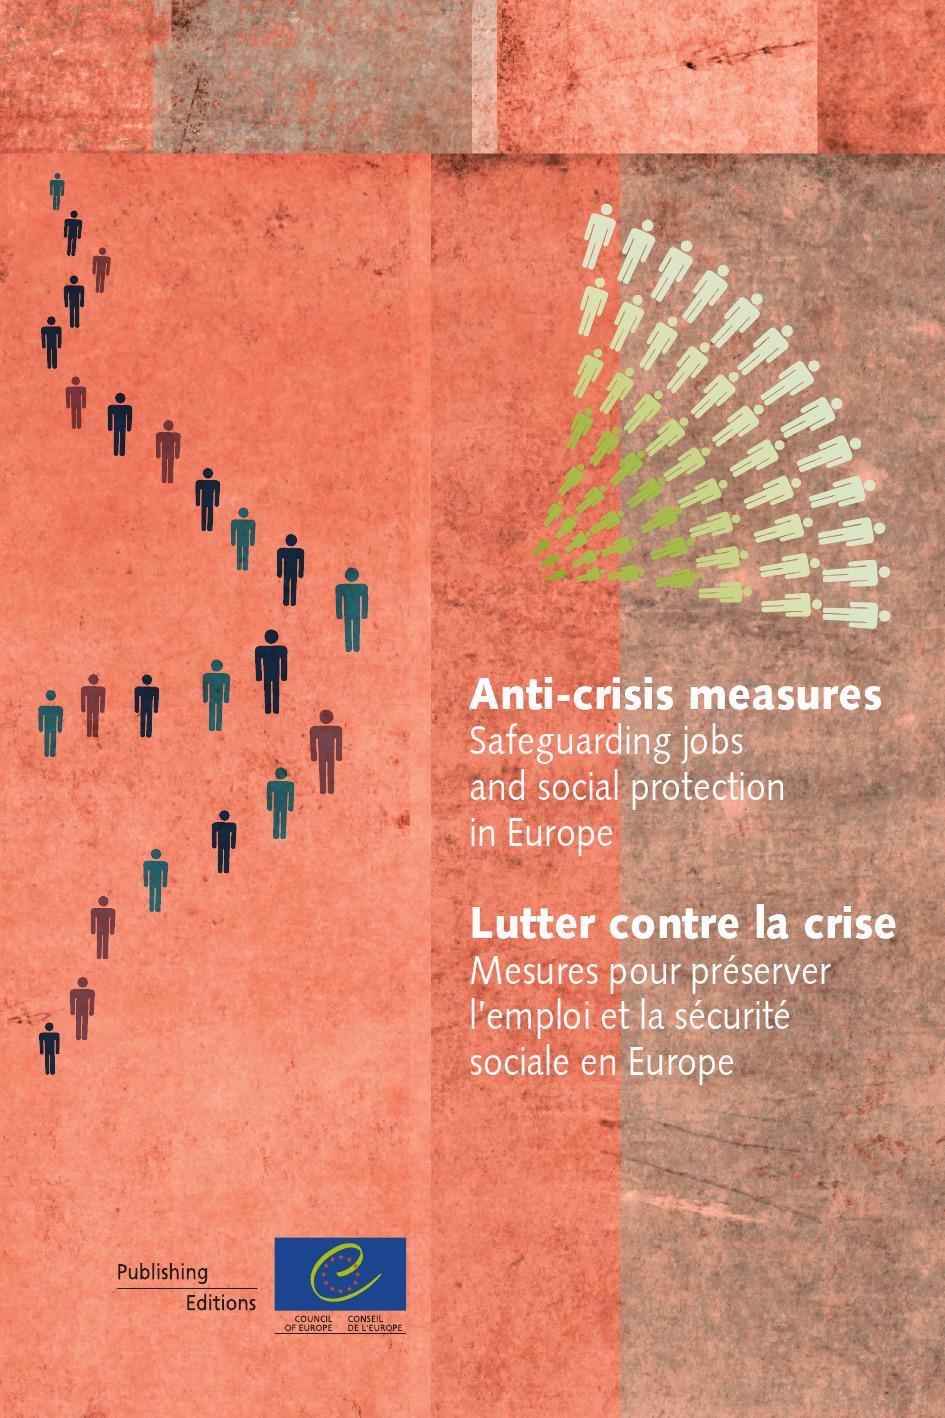 Anti-crisis measures